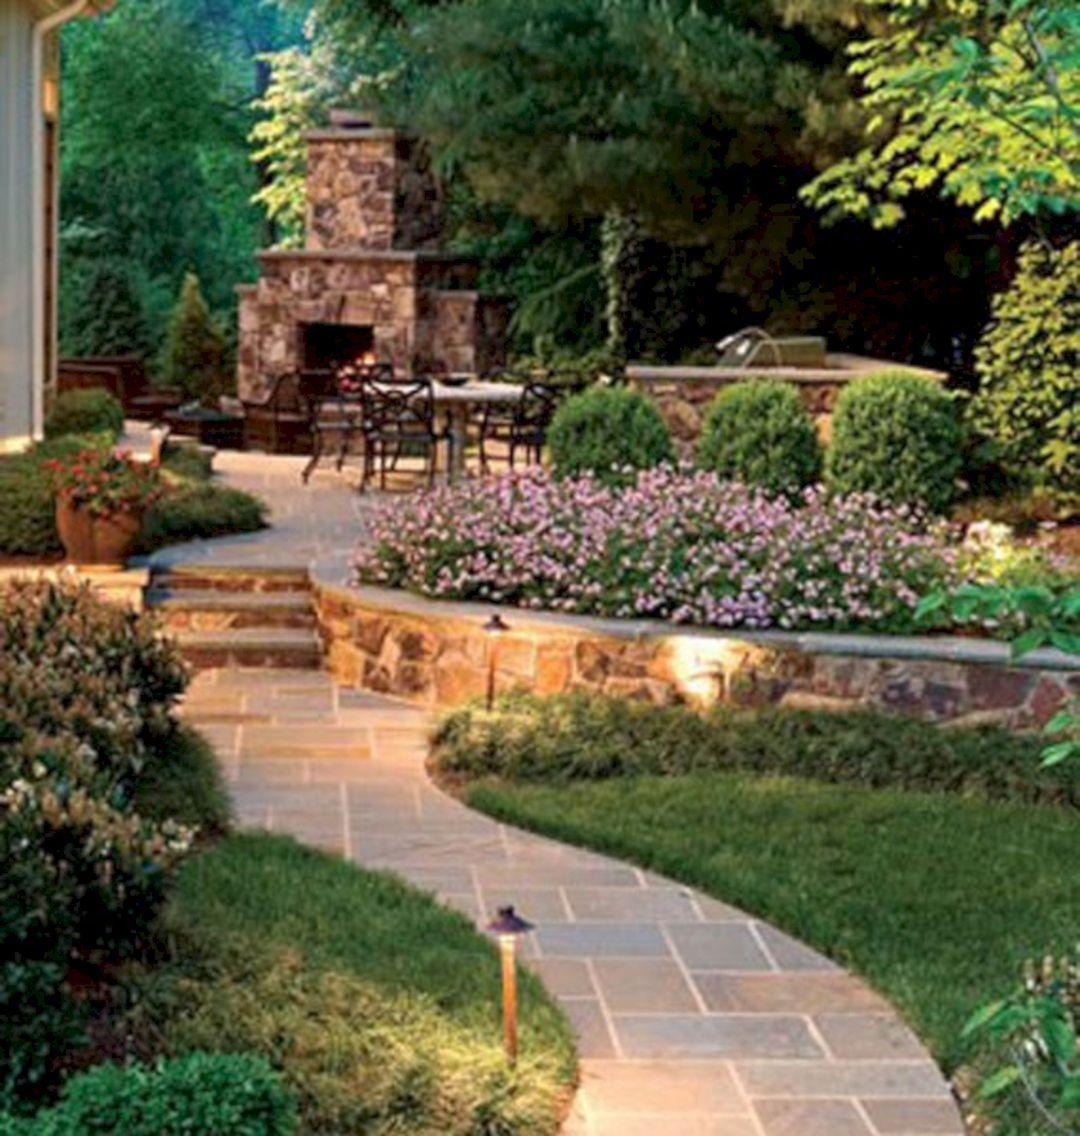 Pin By Julie Gathman On Outside Garden Decor Ideas Narrow